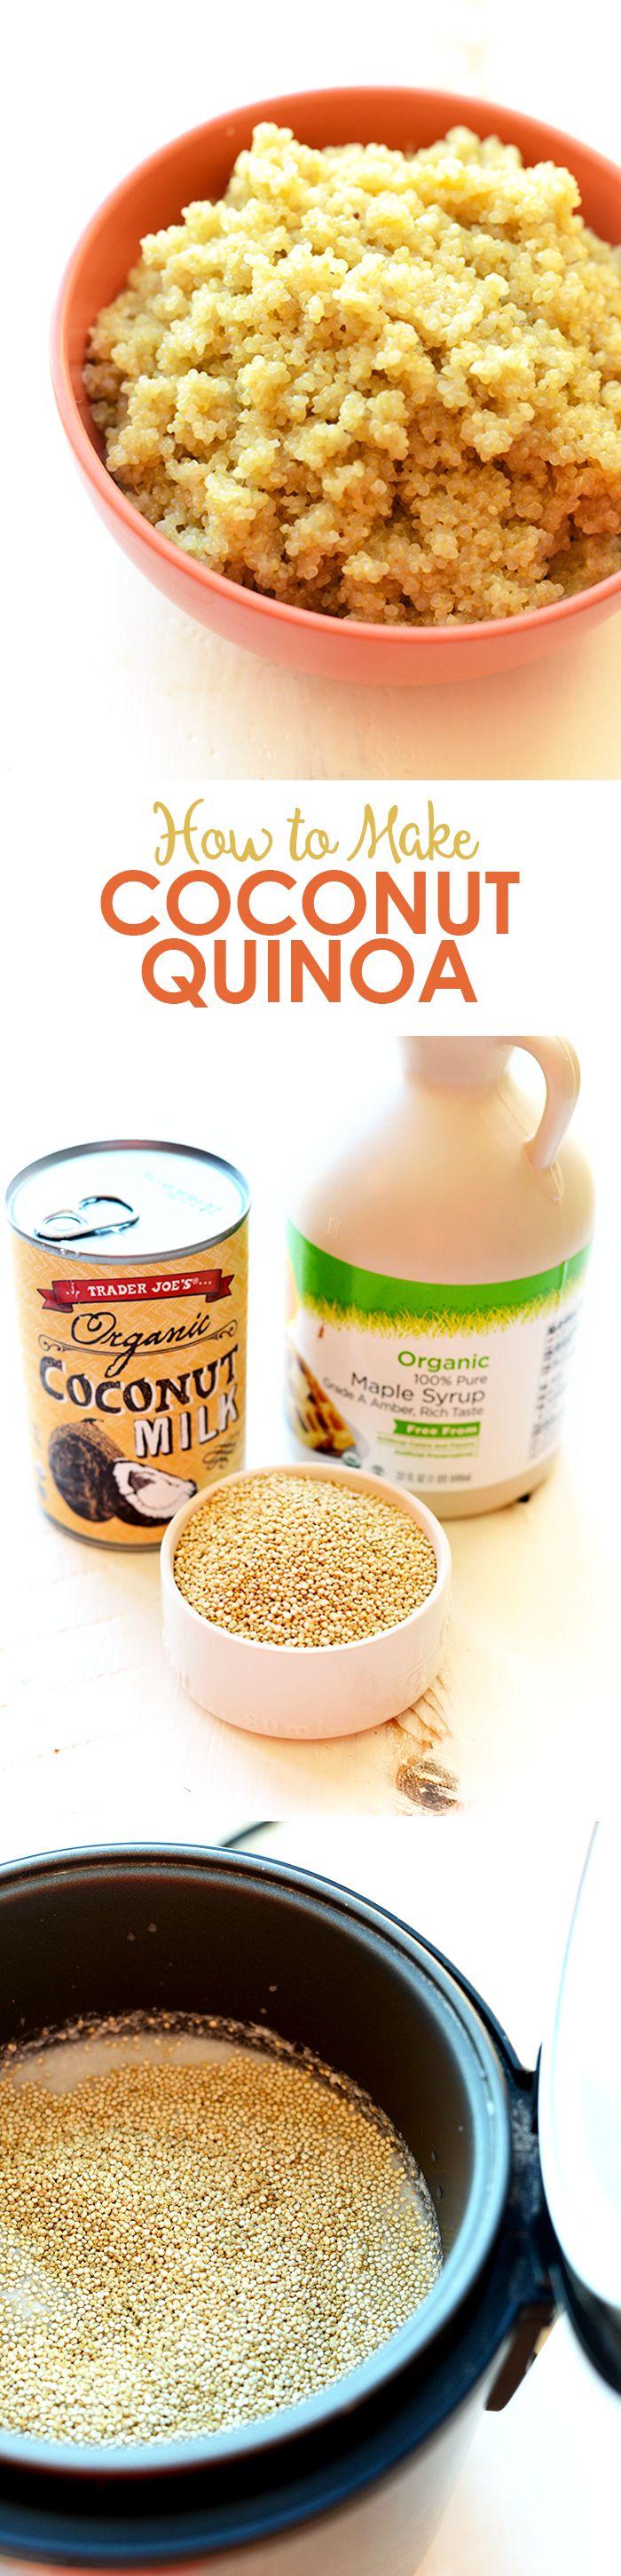 How To Make Coconut Quinoa